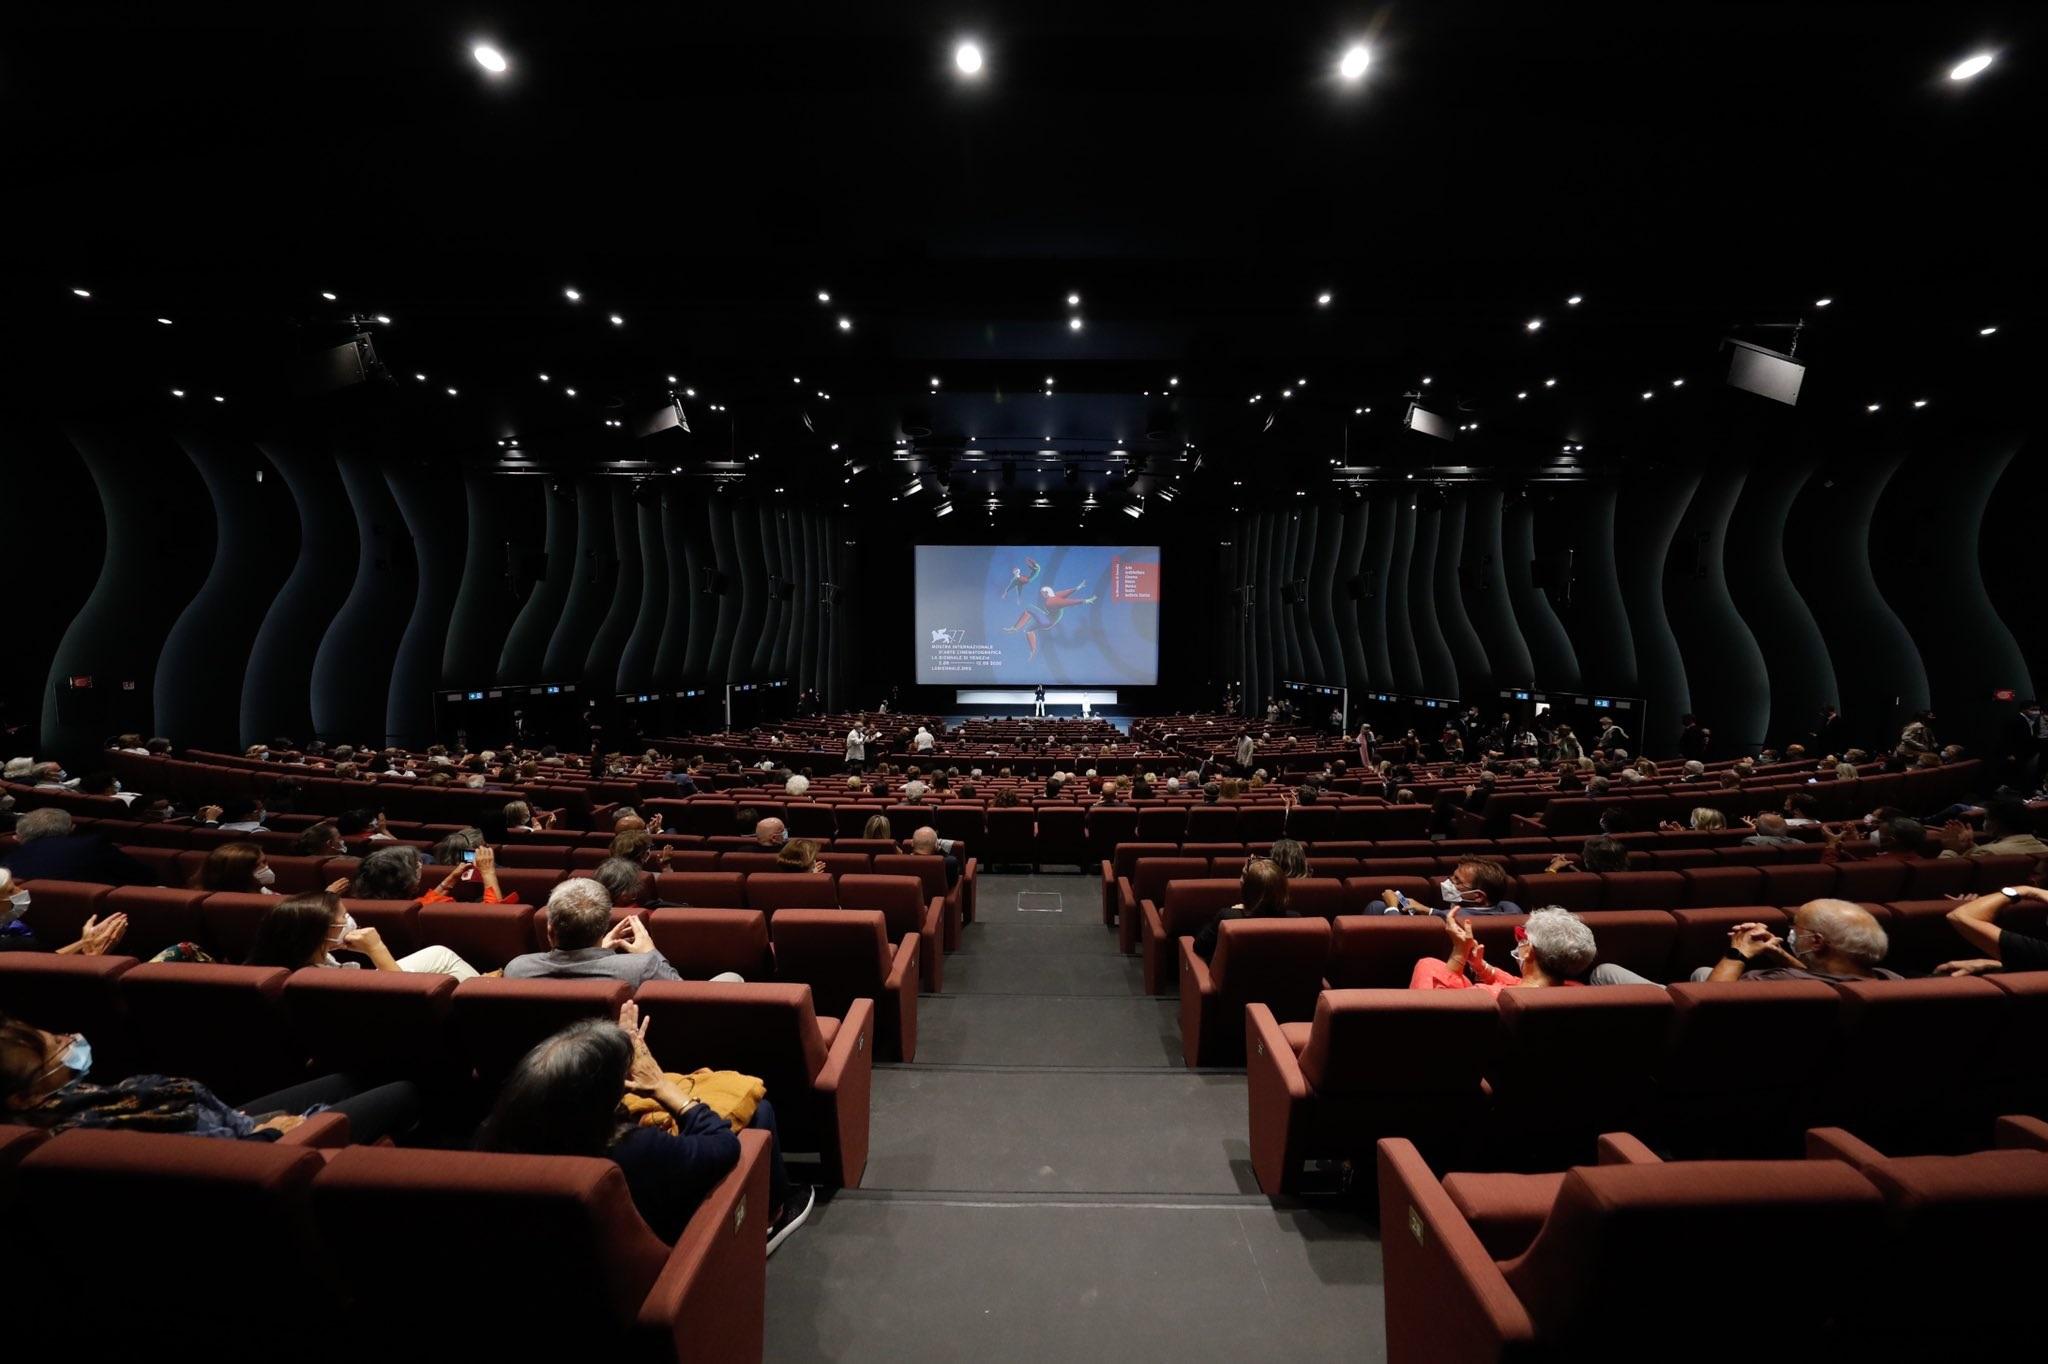 Festival de Cine de Venecia